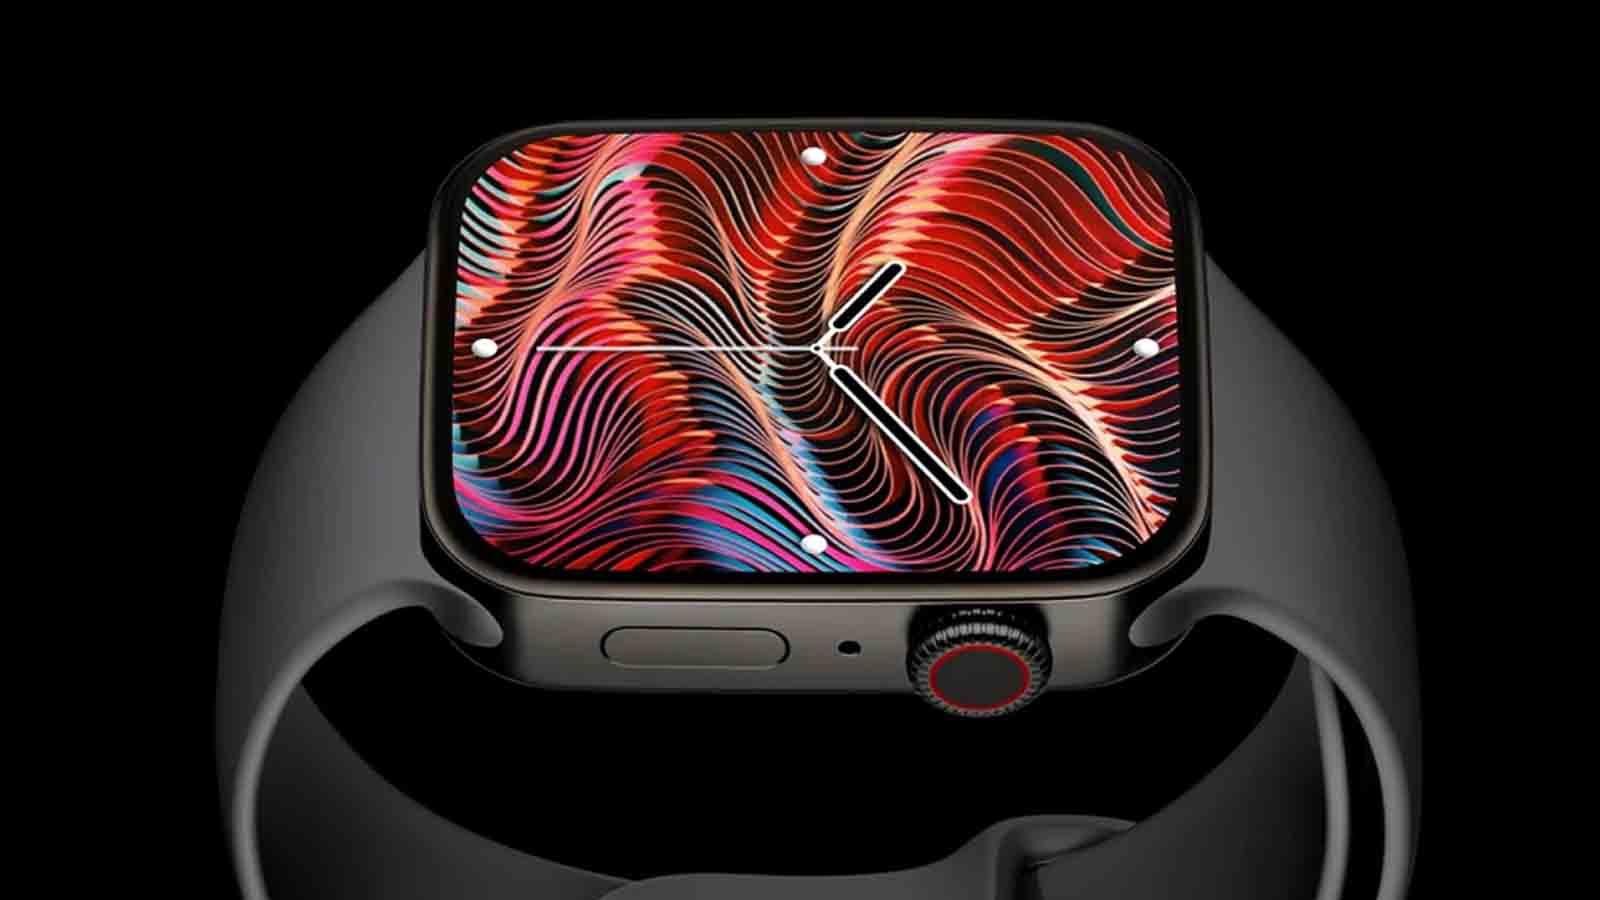 apple watch series 7 design render